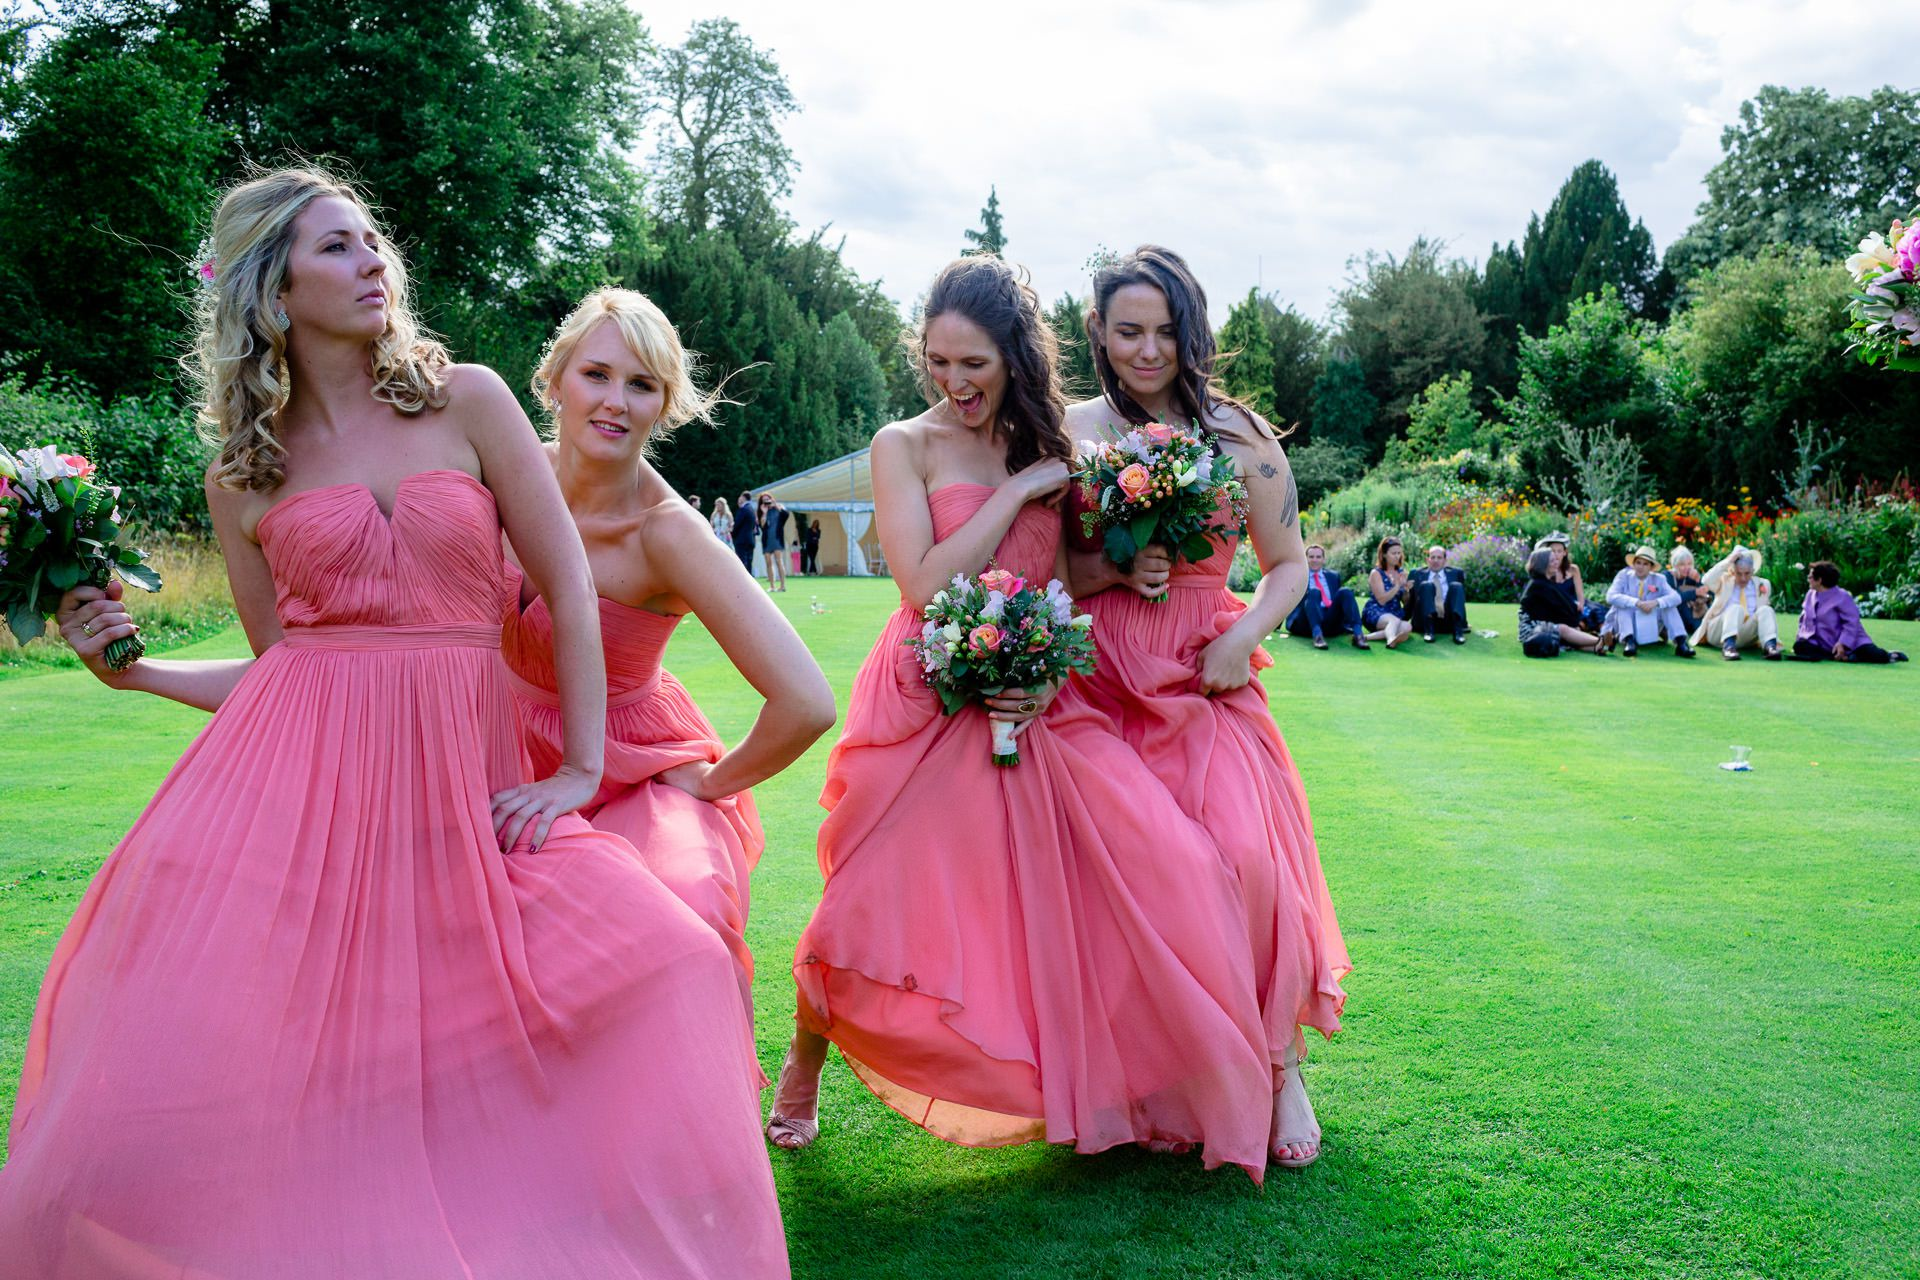 women on the wedding in the garden